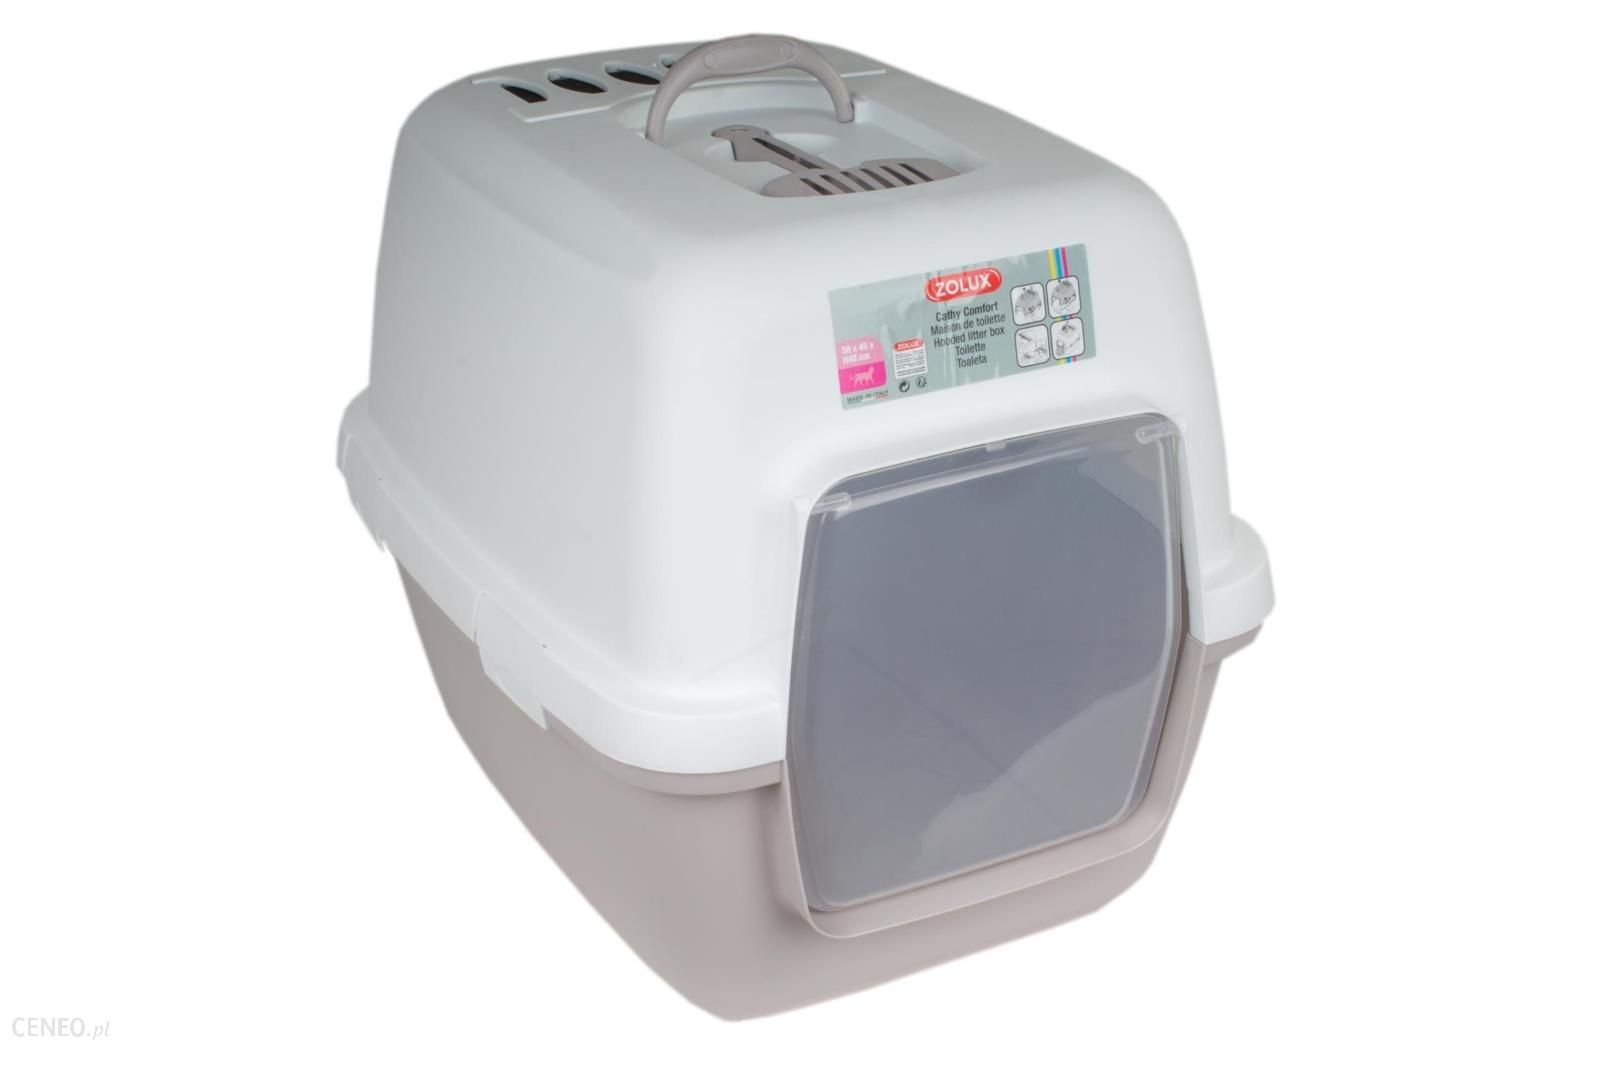 Stefanplast Cathy Comfort Toaleta + Filtr + Łopatka Beżowa (zl97956)